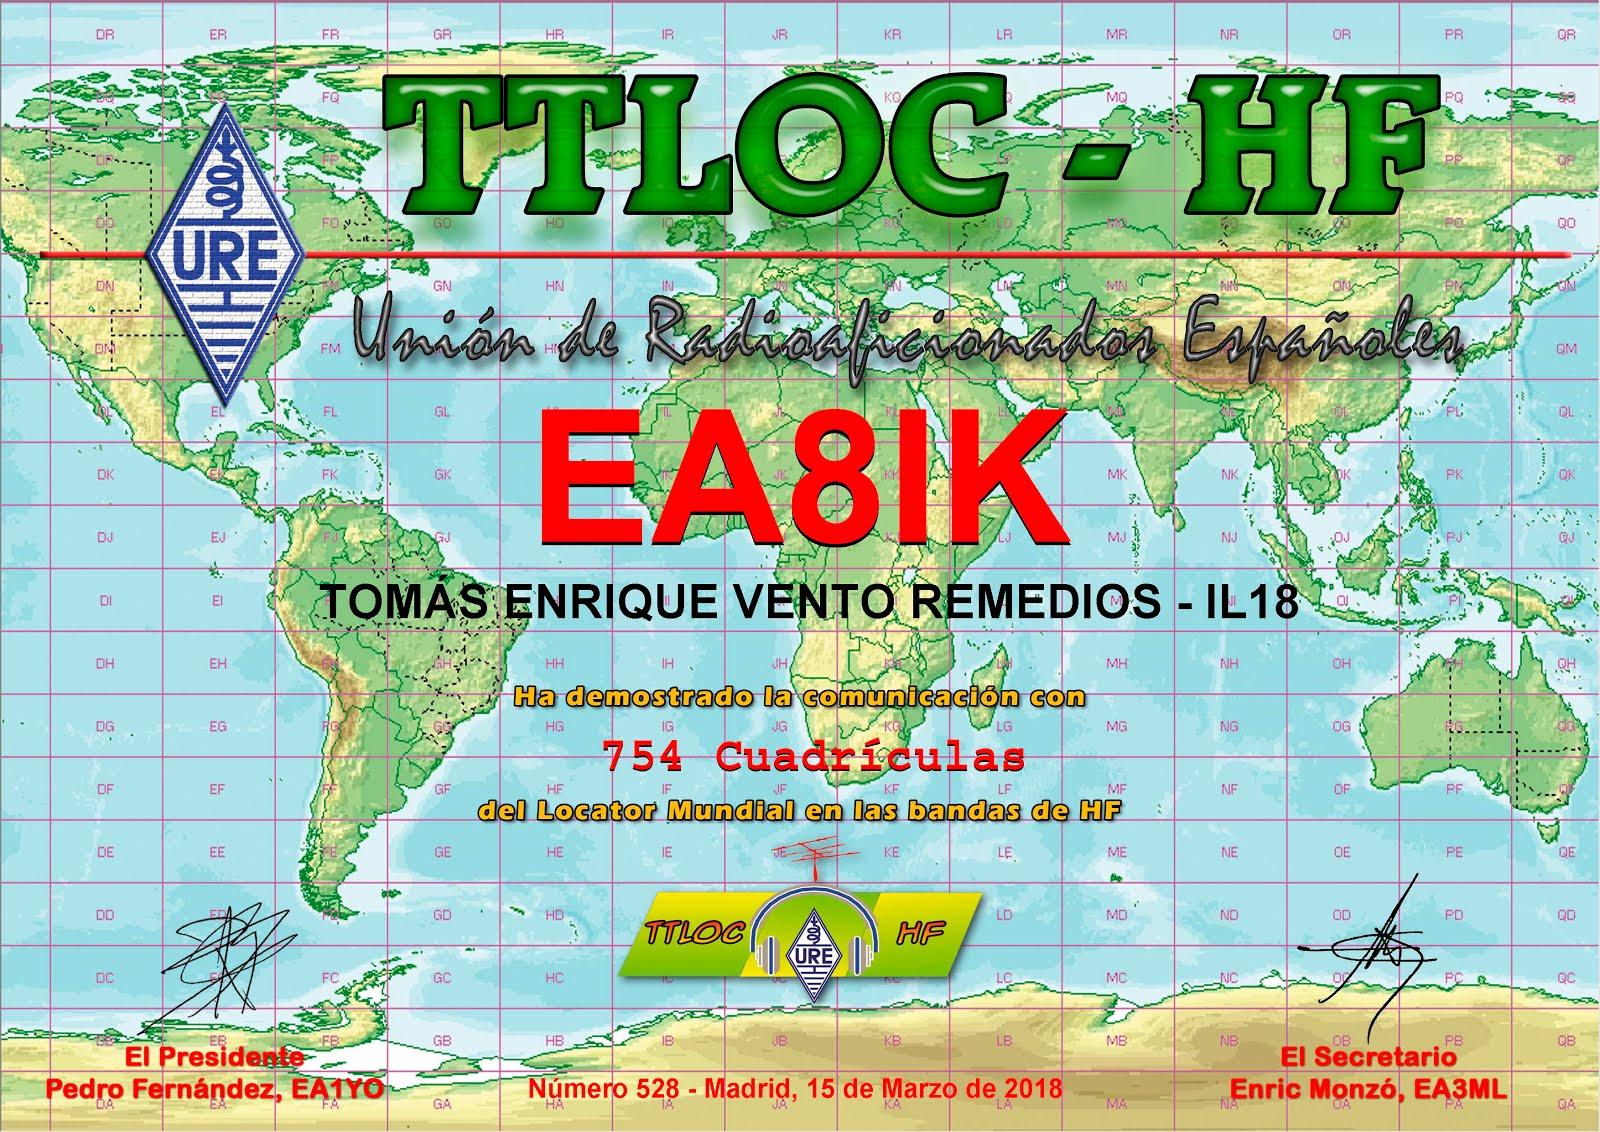 TTLOC - HF